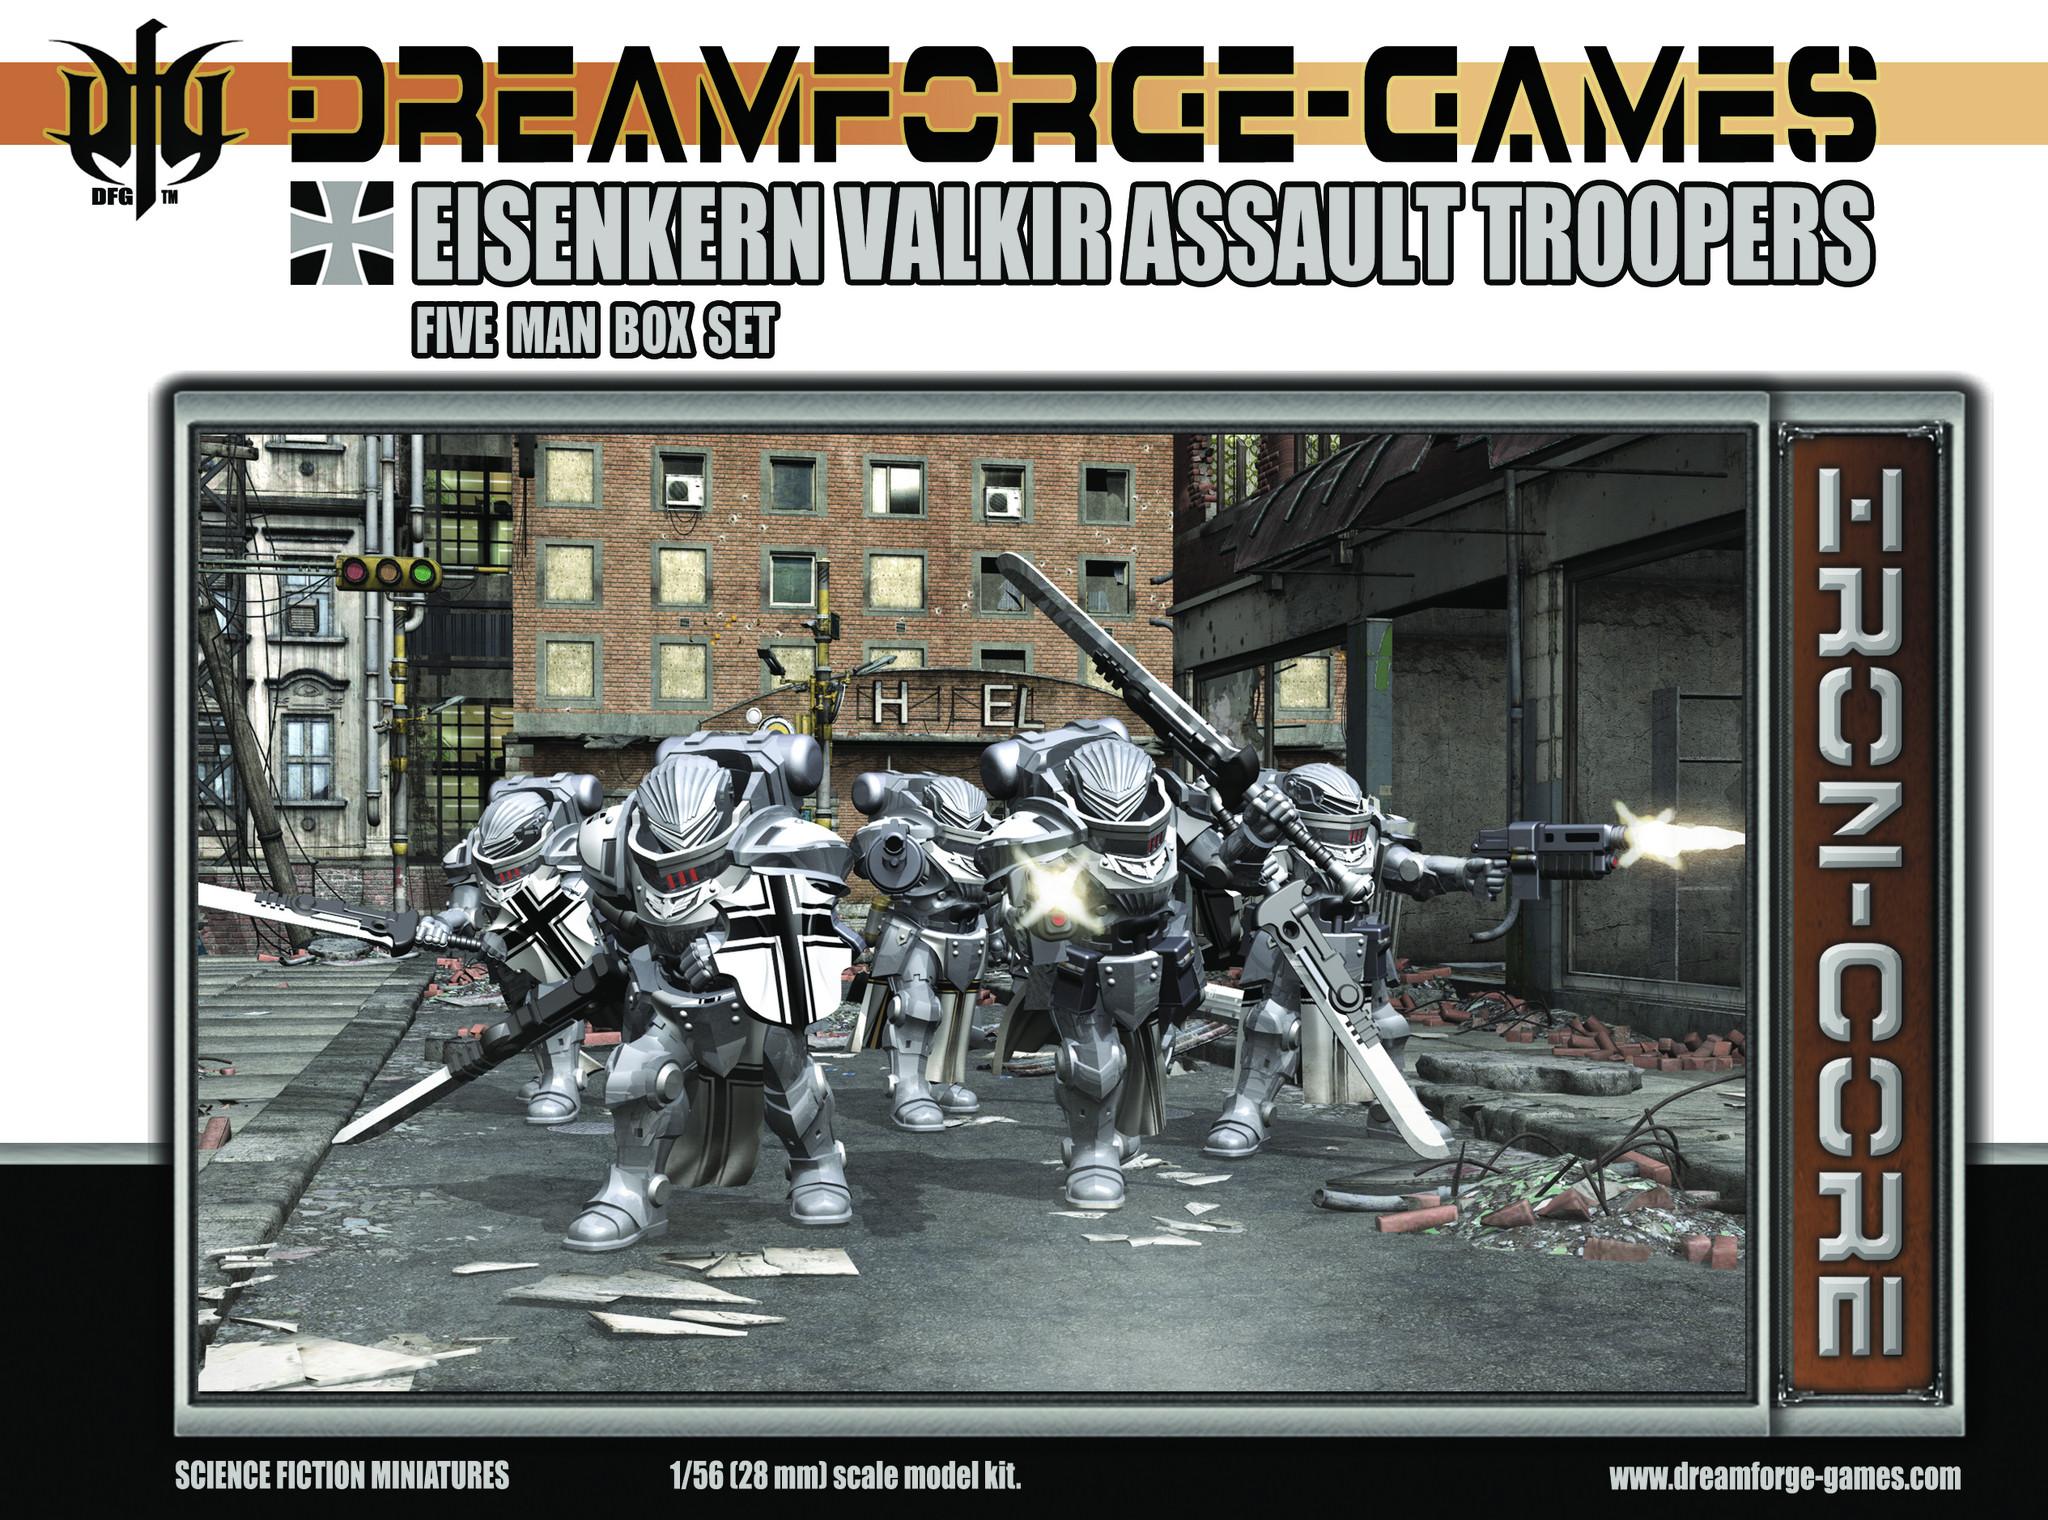 Eisenkern_Valkir_Assault_Troopers_box_front